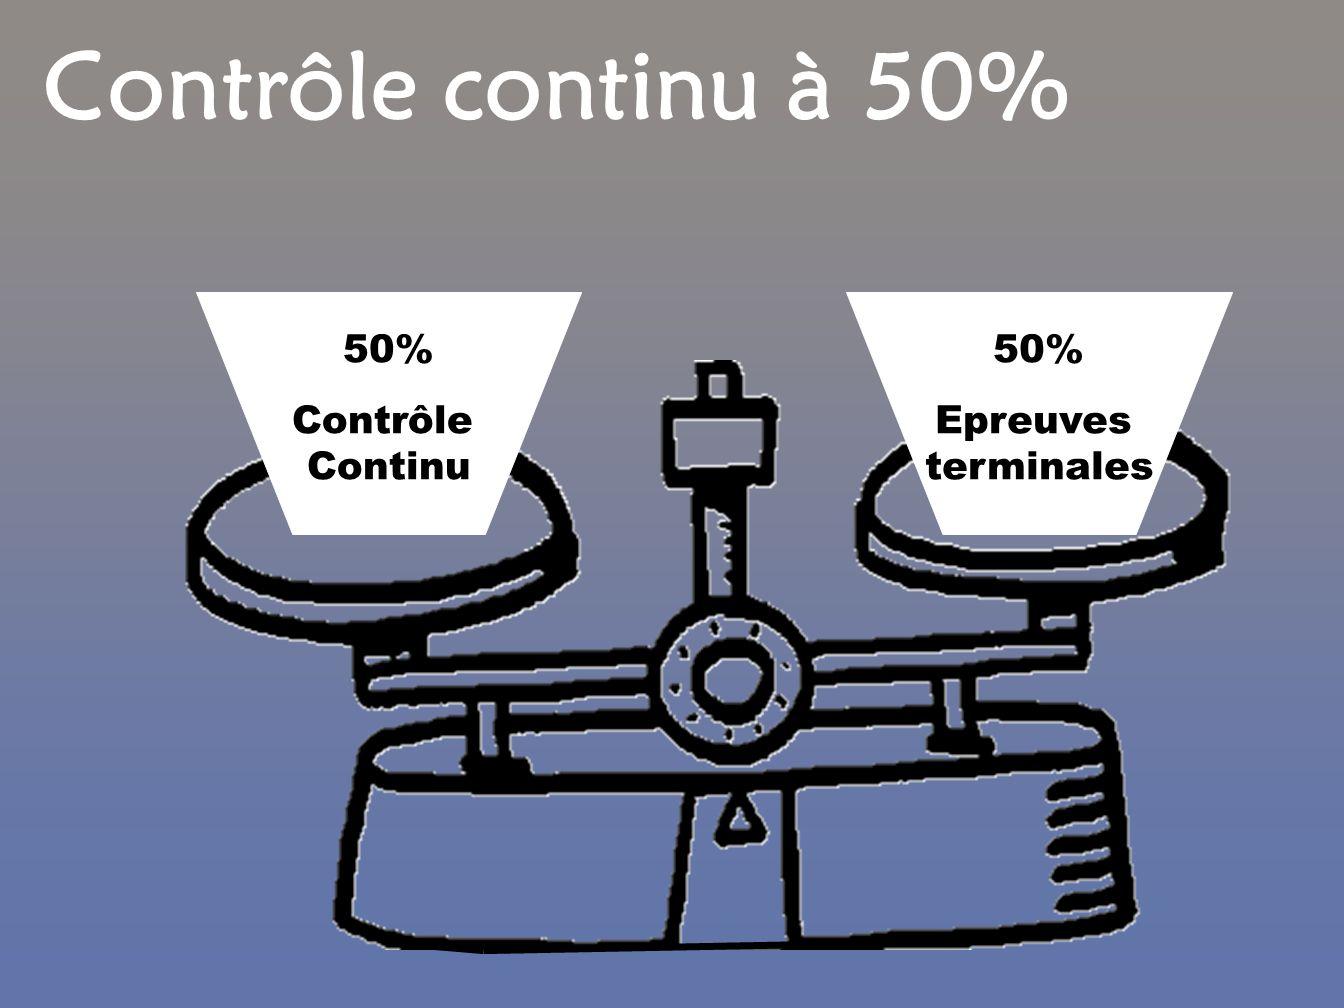 Contrôle continu à 50% 50% Epreuves terminales 50% Contrôle Continu